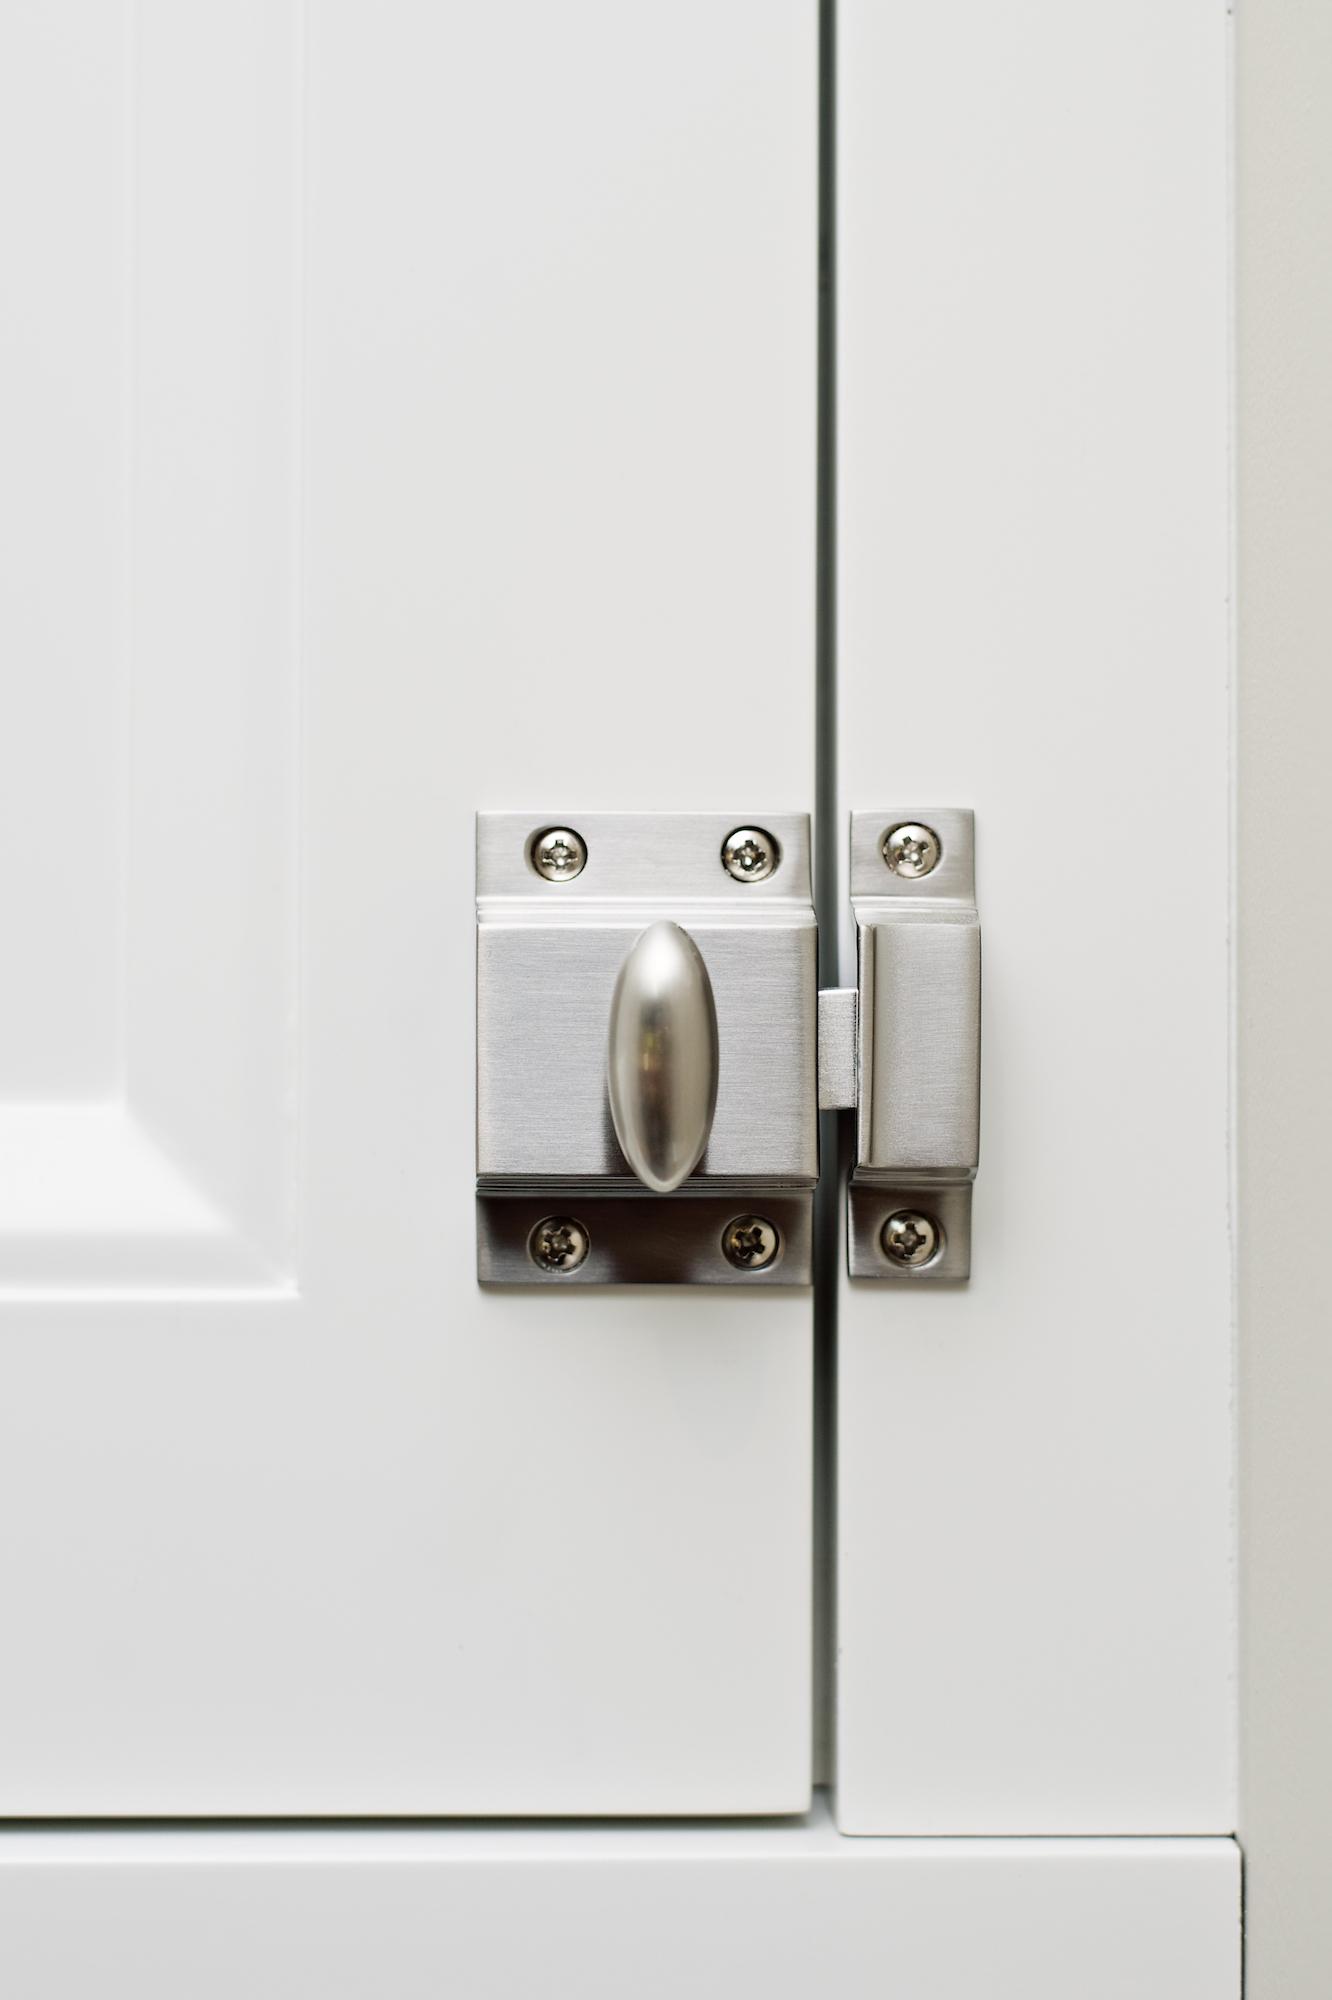 11 Pizzale Design Interior Decorating white millwork lock door .jpg